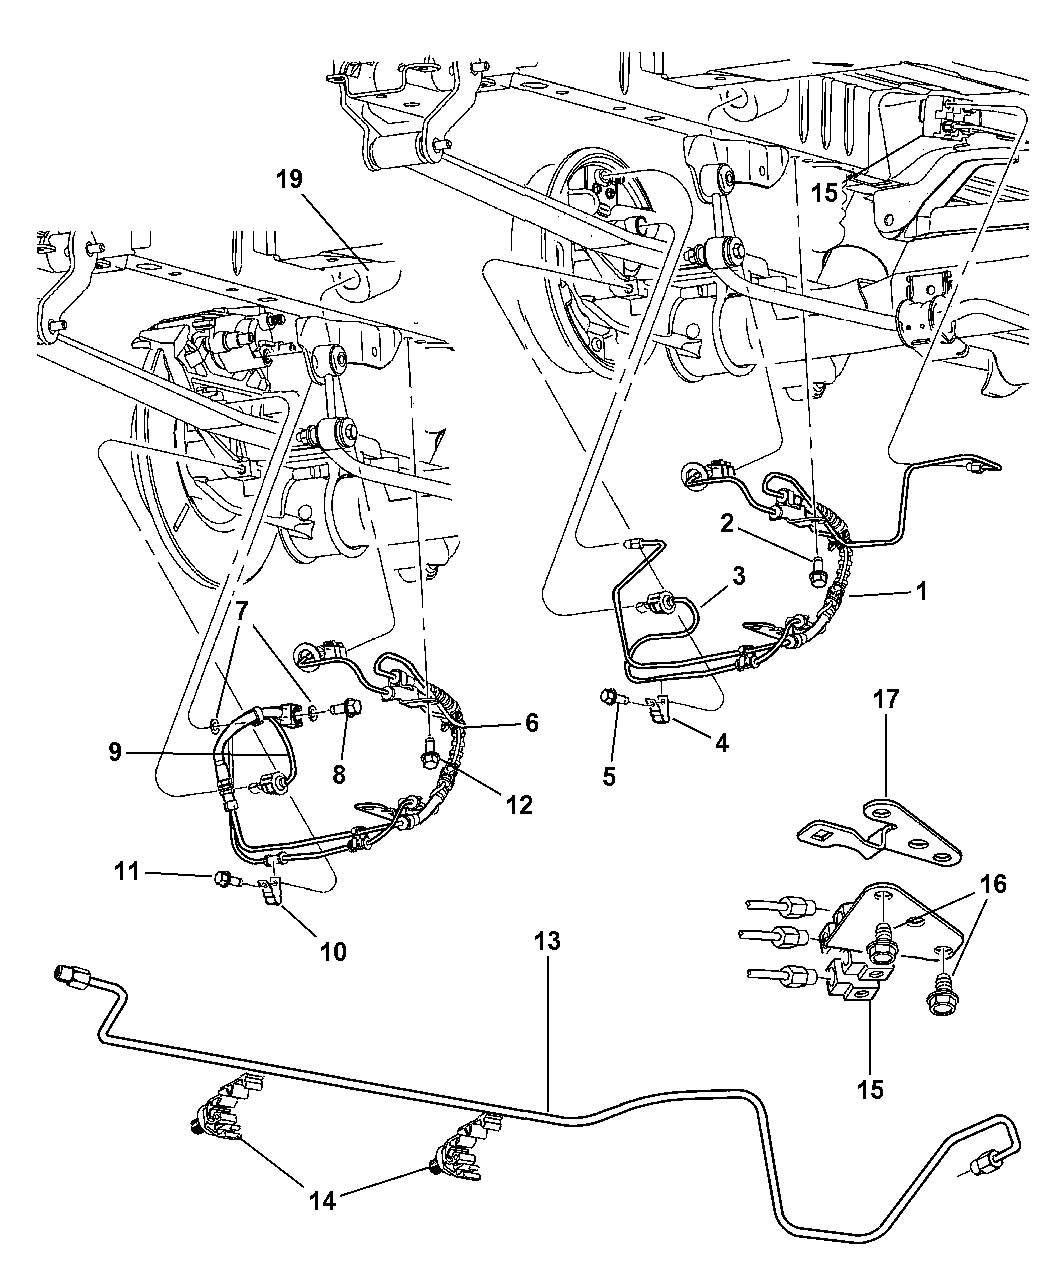 2005 dodge caravan parts diagram hoses  u2022 wiring diagram